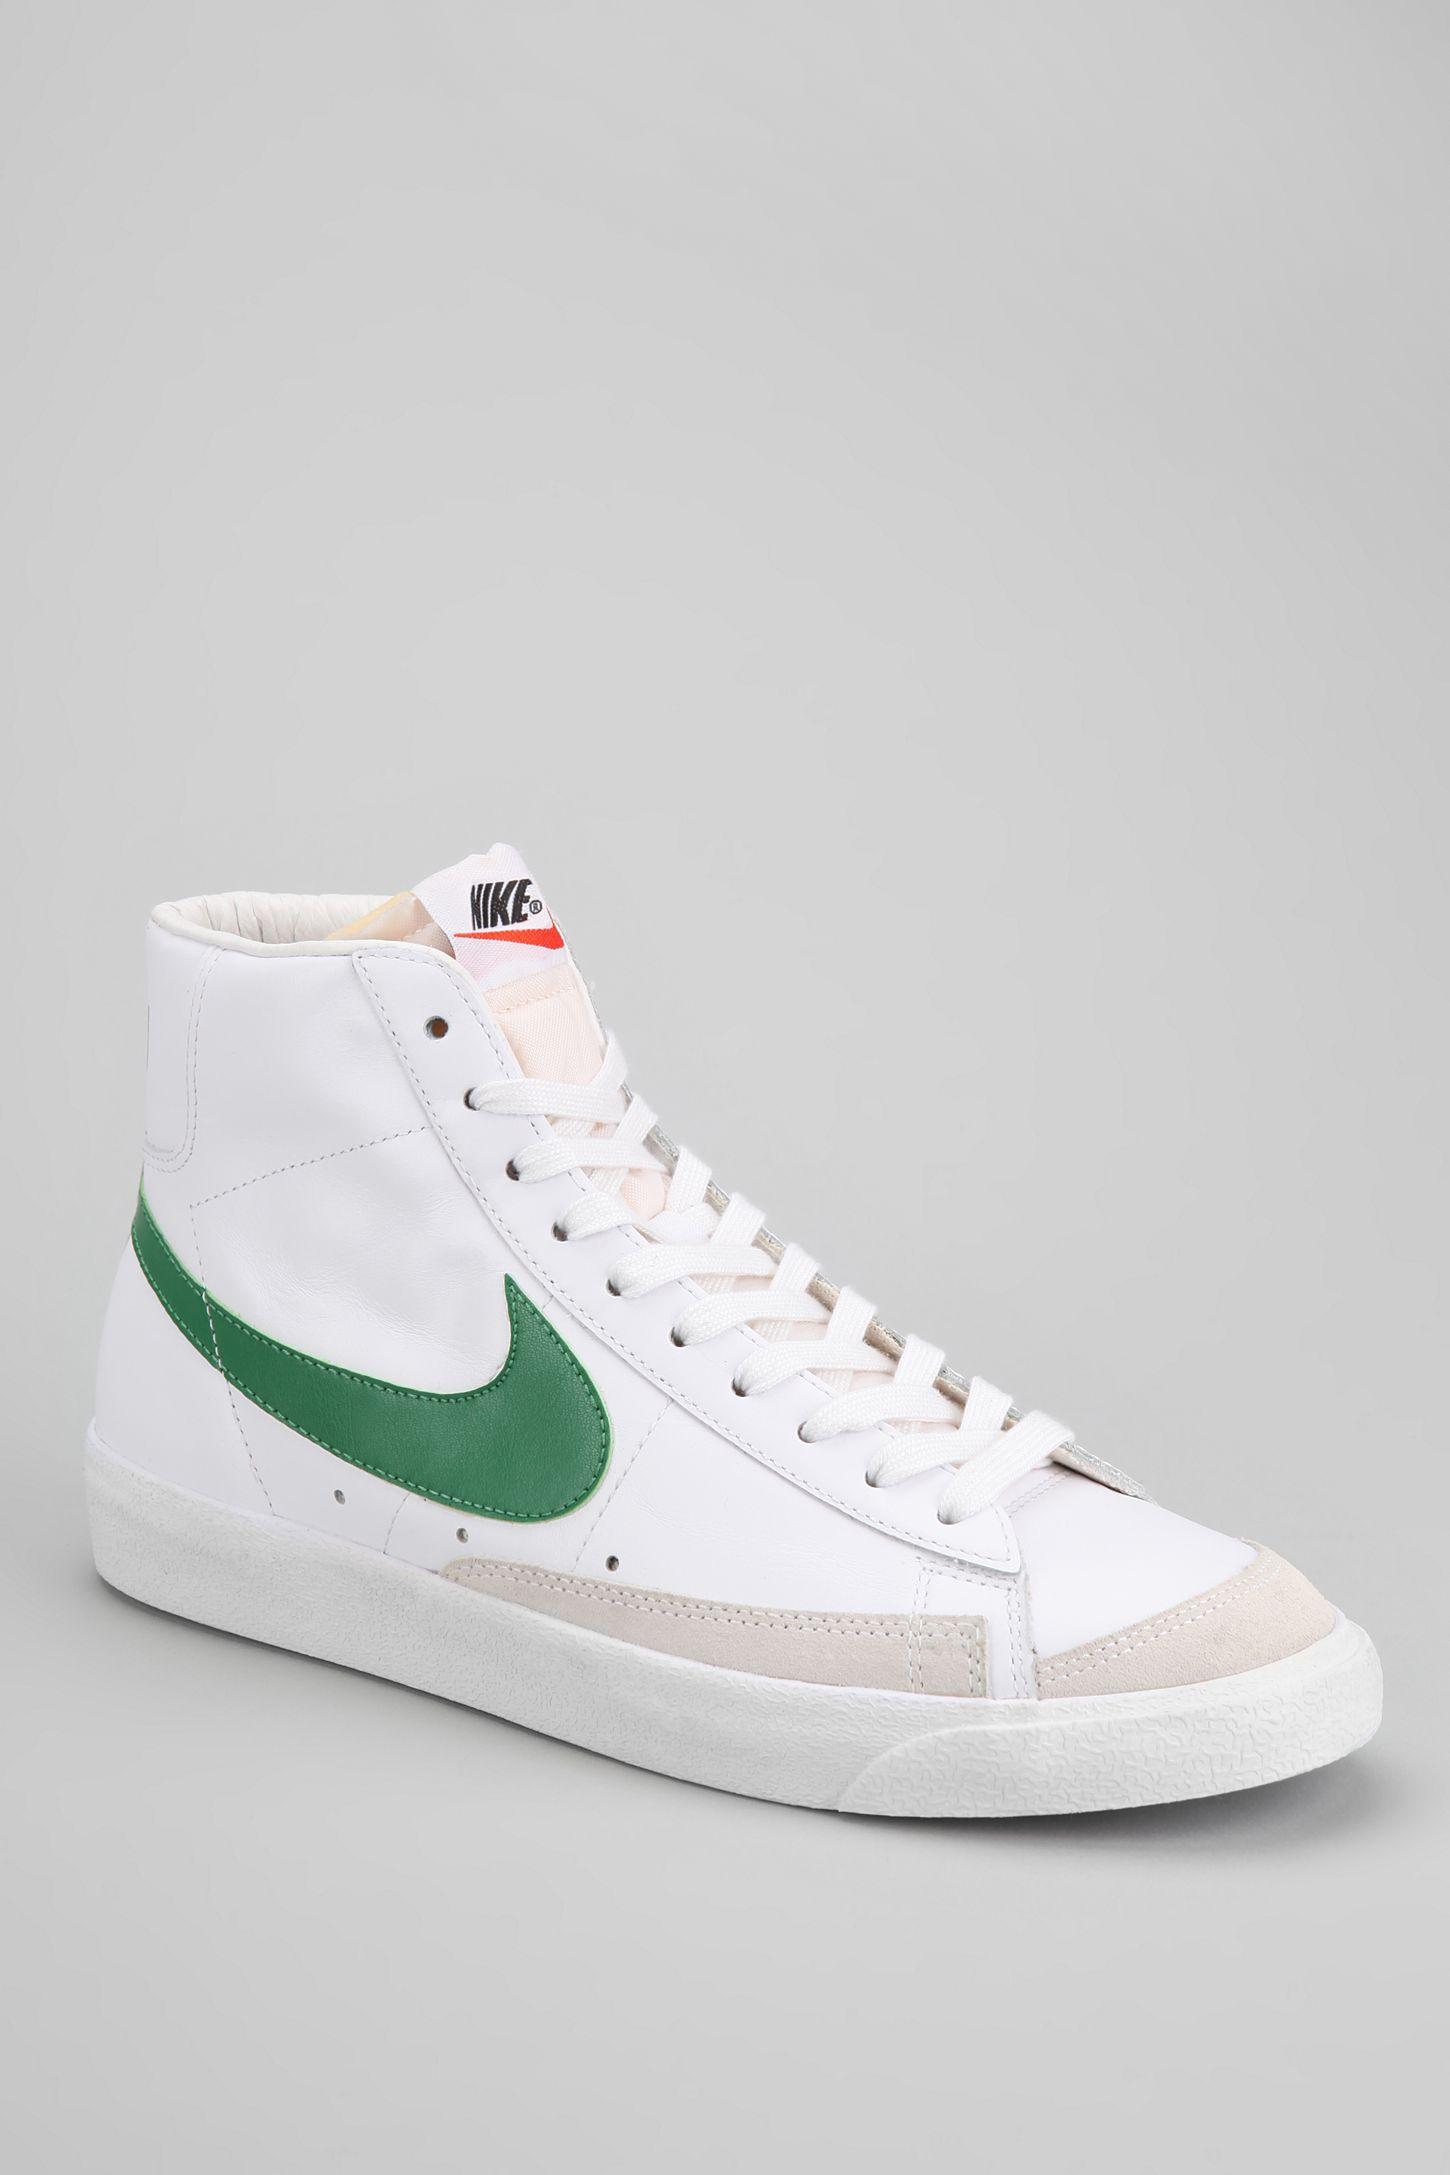 super popular ef8c2 c21c1 Nike Blazer Mid Cut 77 Premium Sneaker   Urban Outfitters nike blazer 77  vintage canada